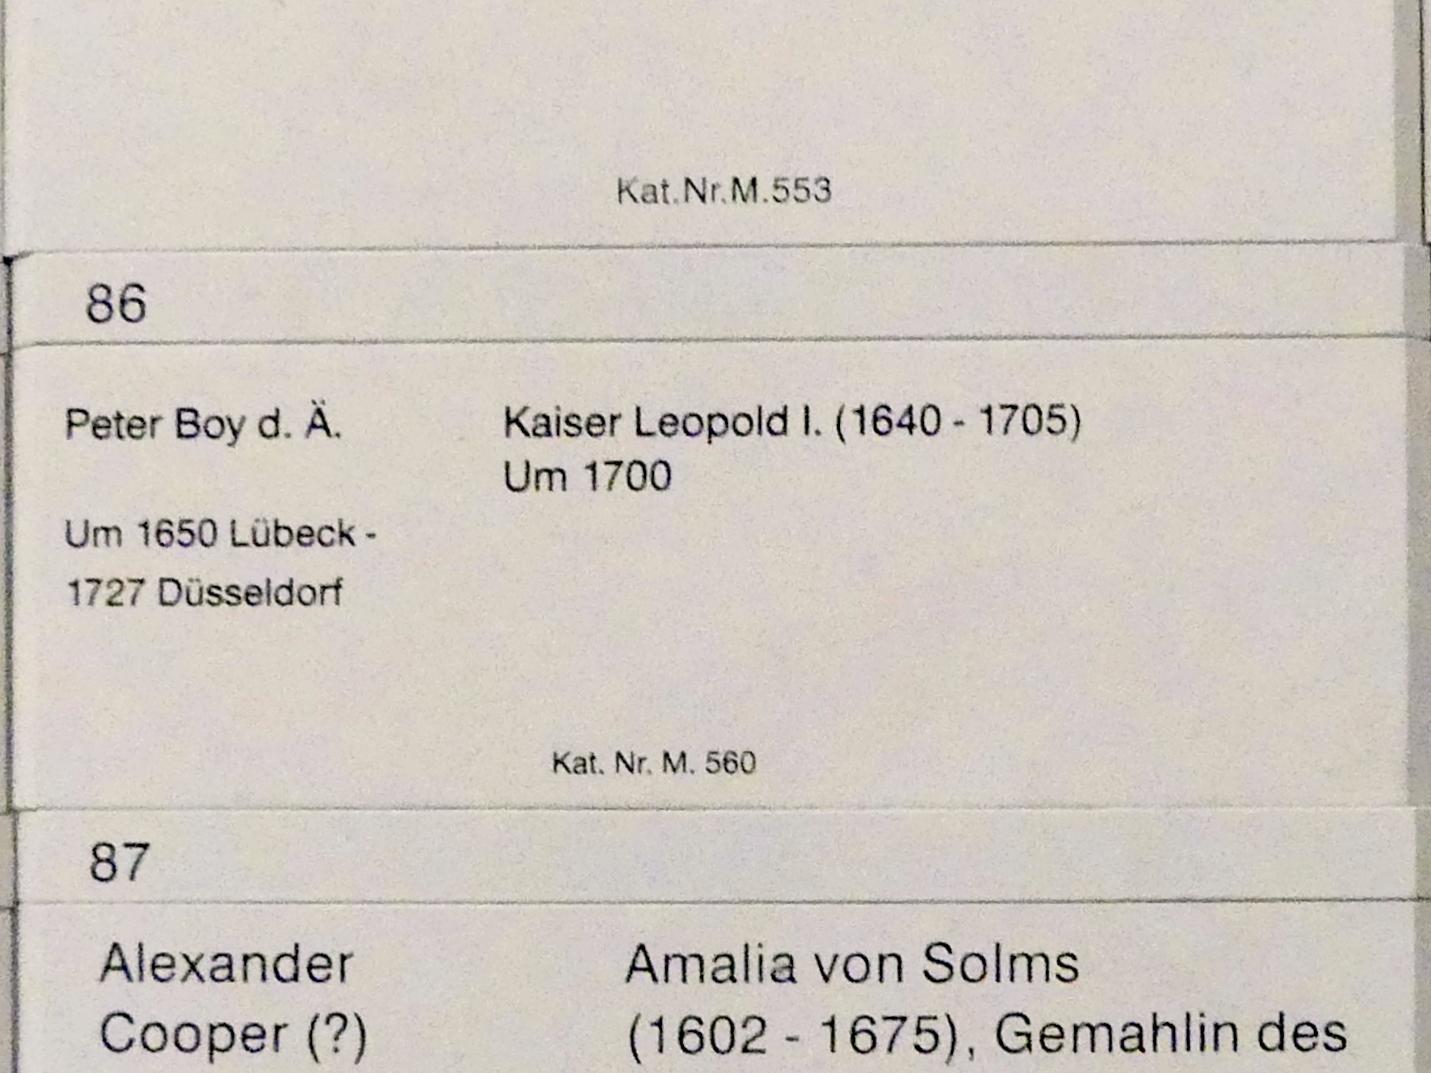 Peter Boy: Kaiser Leopold I. (1640-1705), um 1700, Bild 2/2